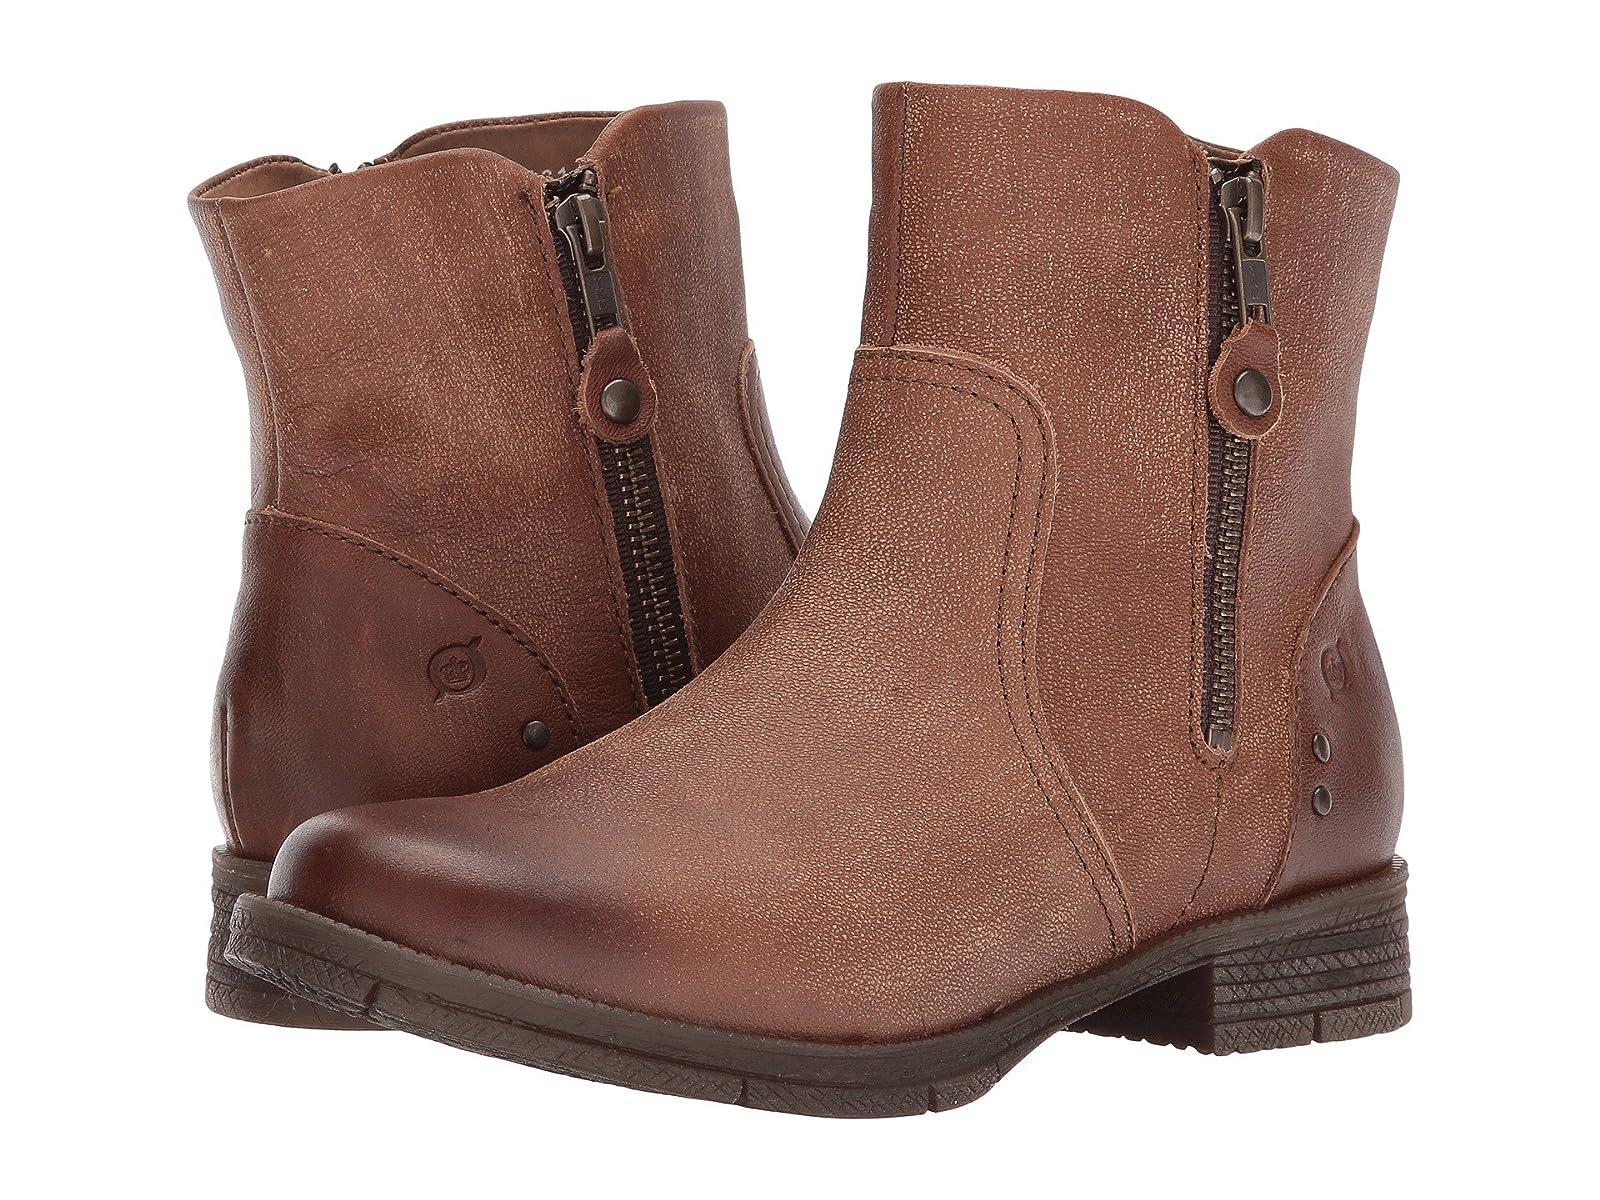 Born HelkaCheap and distinctive eye-catching shoes